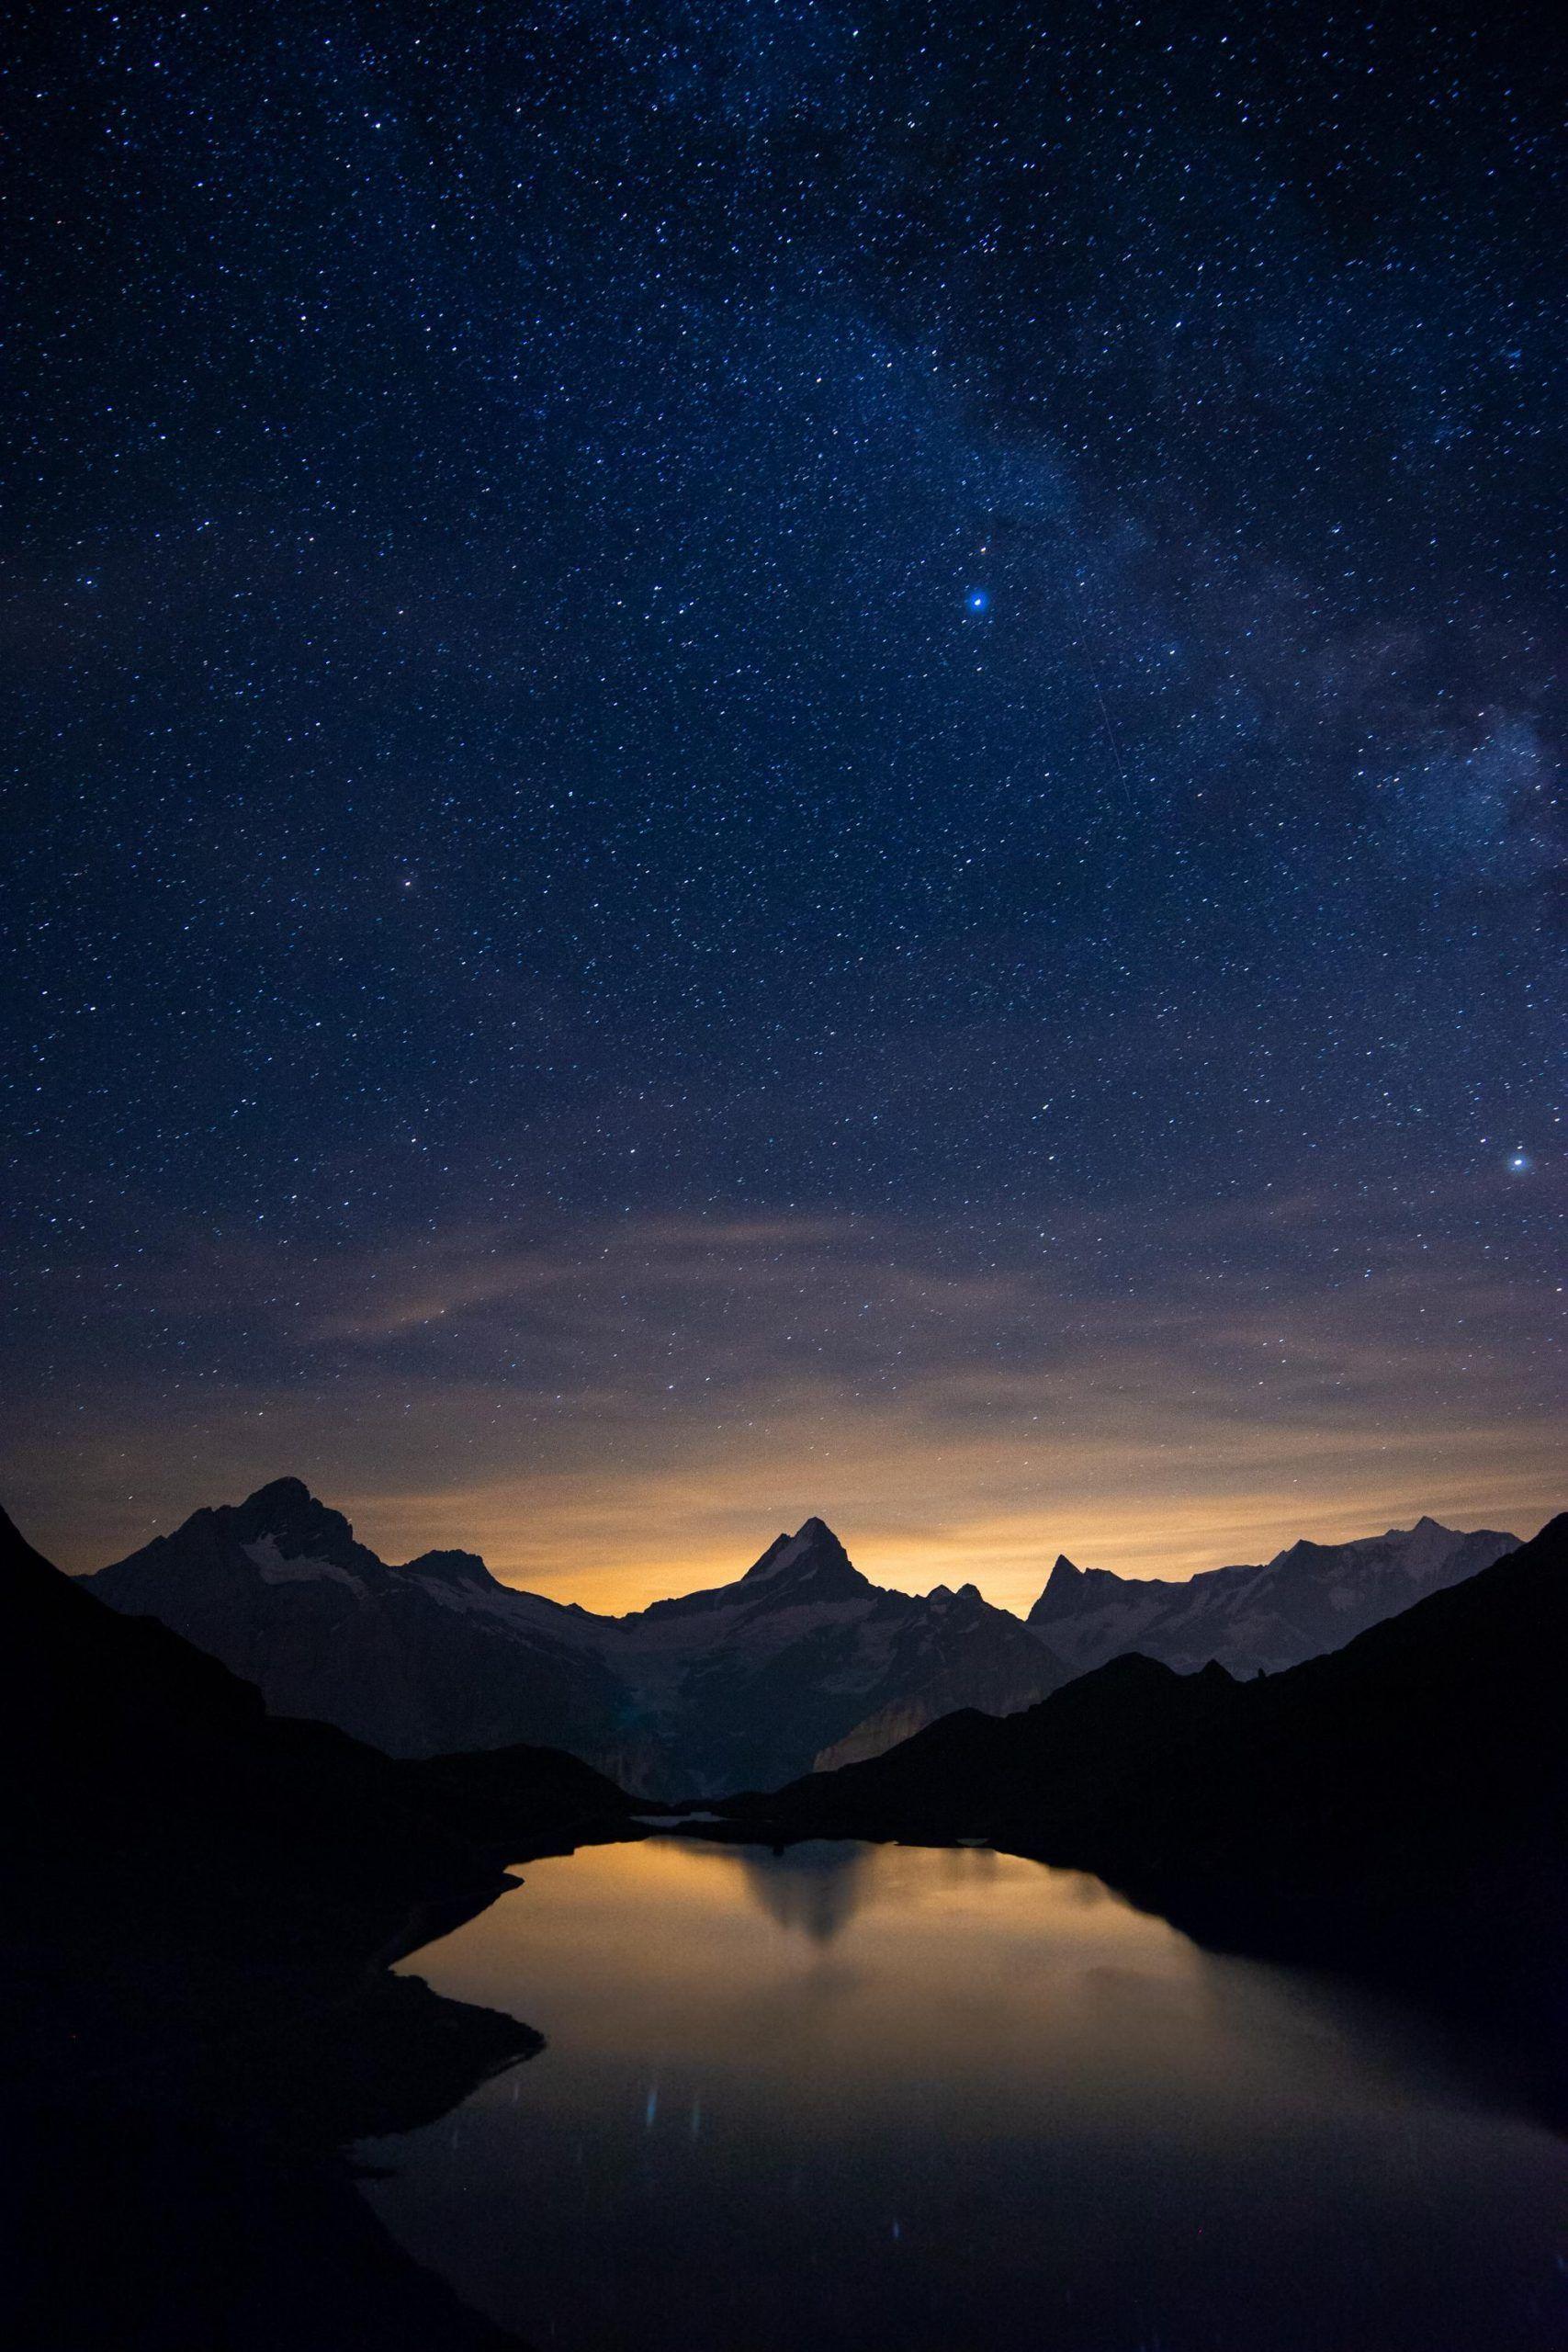 Magical Starry Night At Bachalpsee Switzerland Oc 2000x3000 Amazing Beau 2000x3000 Amazi In 2020 Night Landscape Photography Starry Night Night Landscape